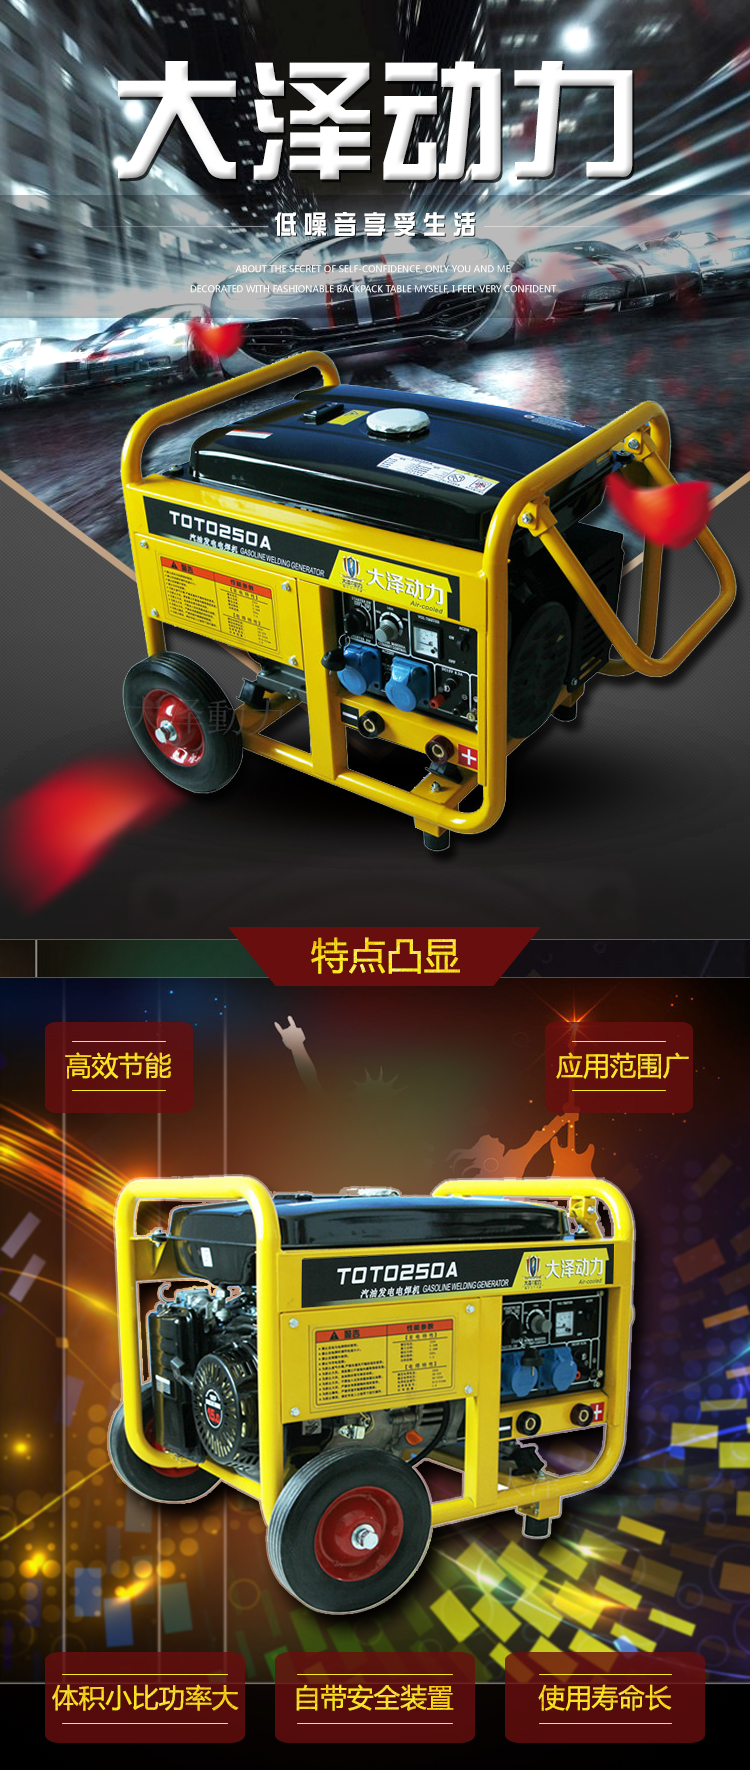 250A汽油焊机TOTO250A彩..